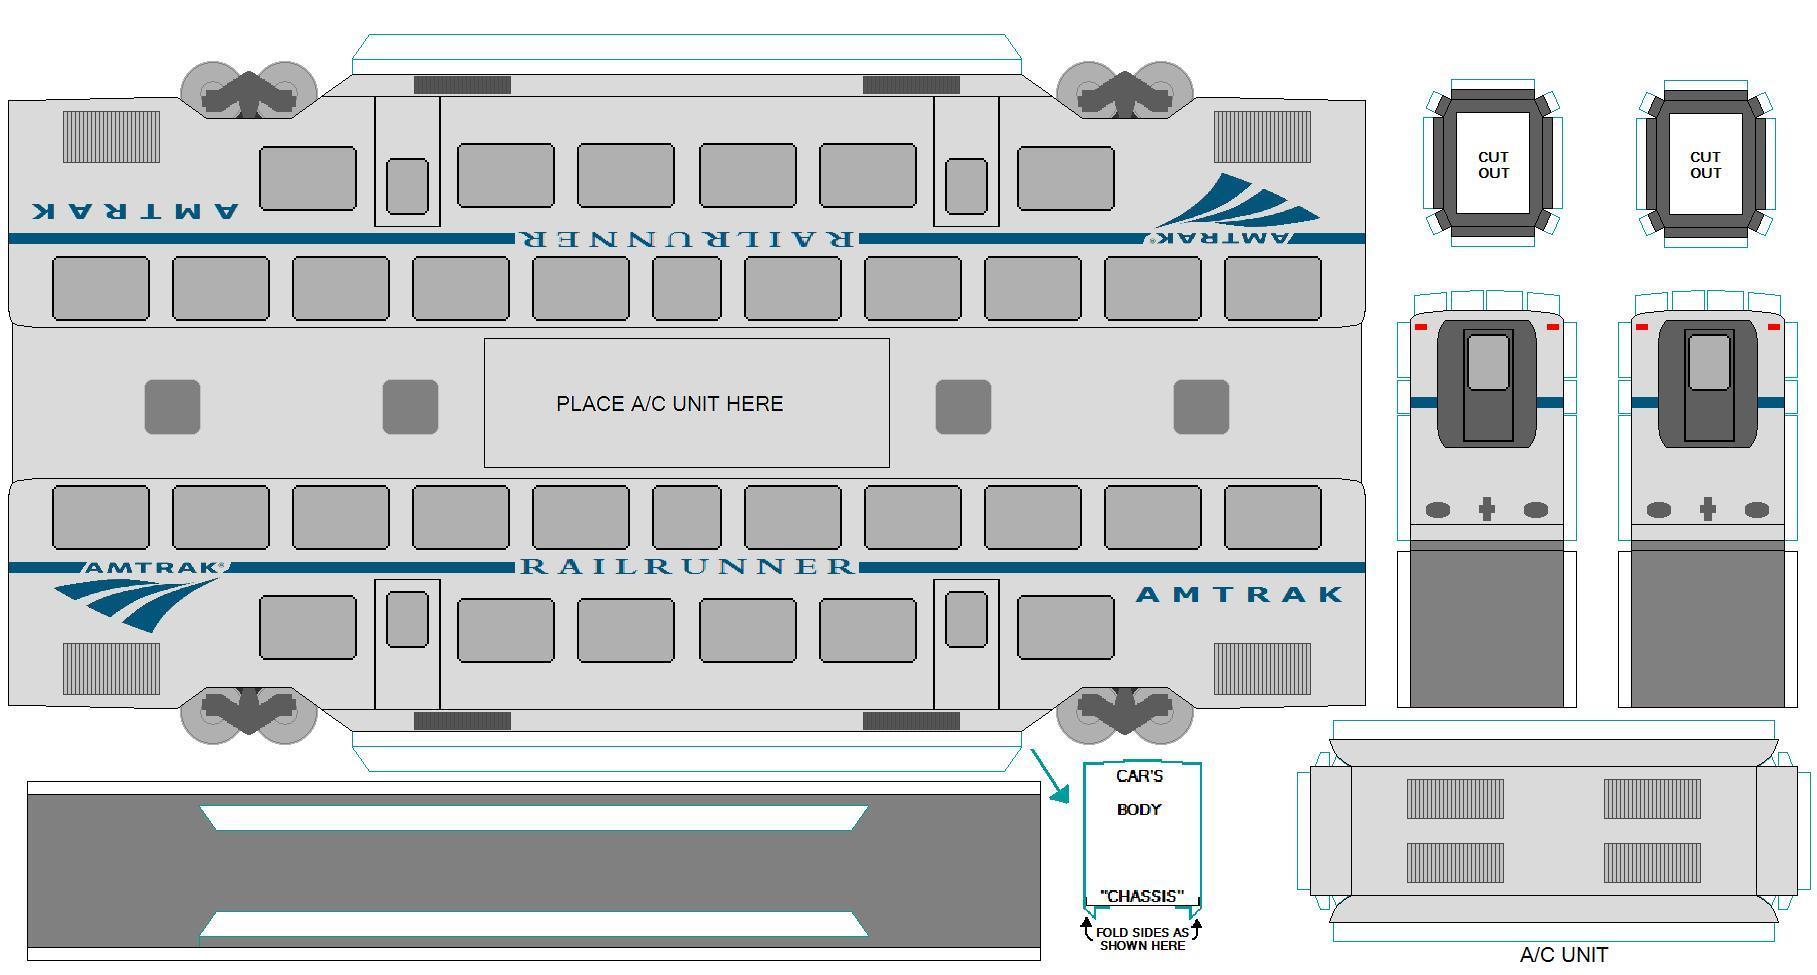 Amtrak_bi_level_train_car.PNG